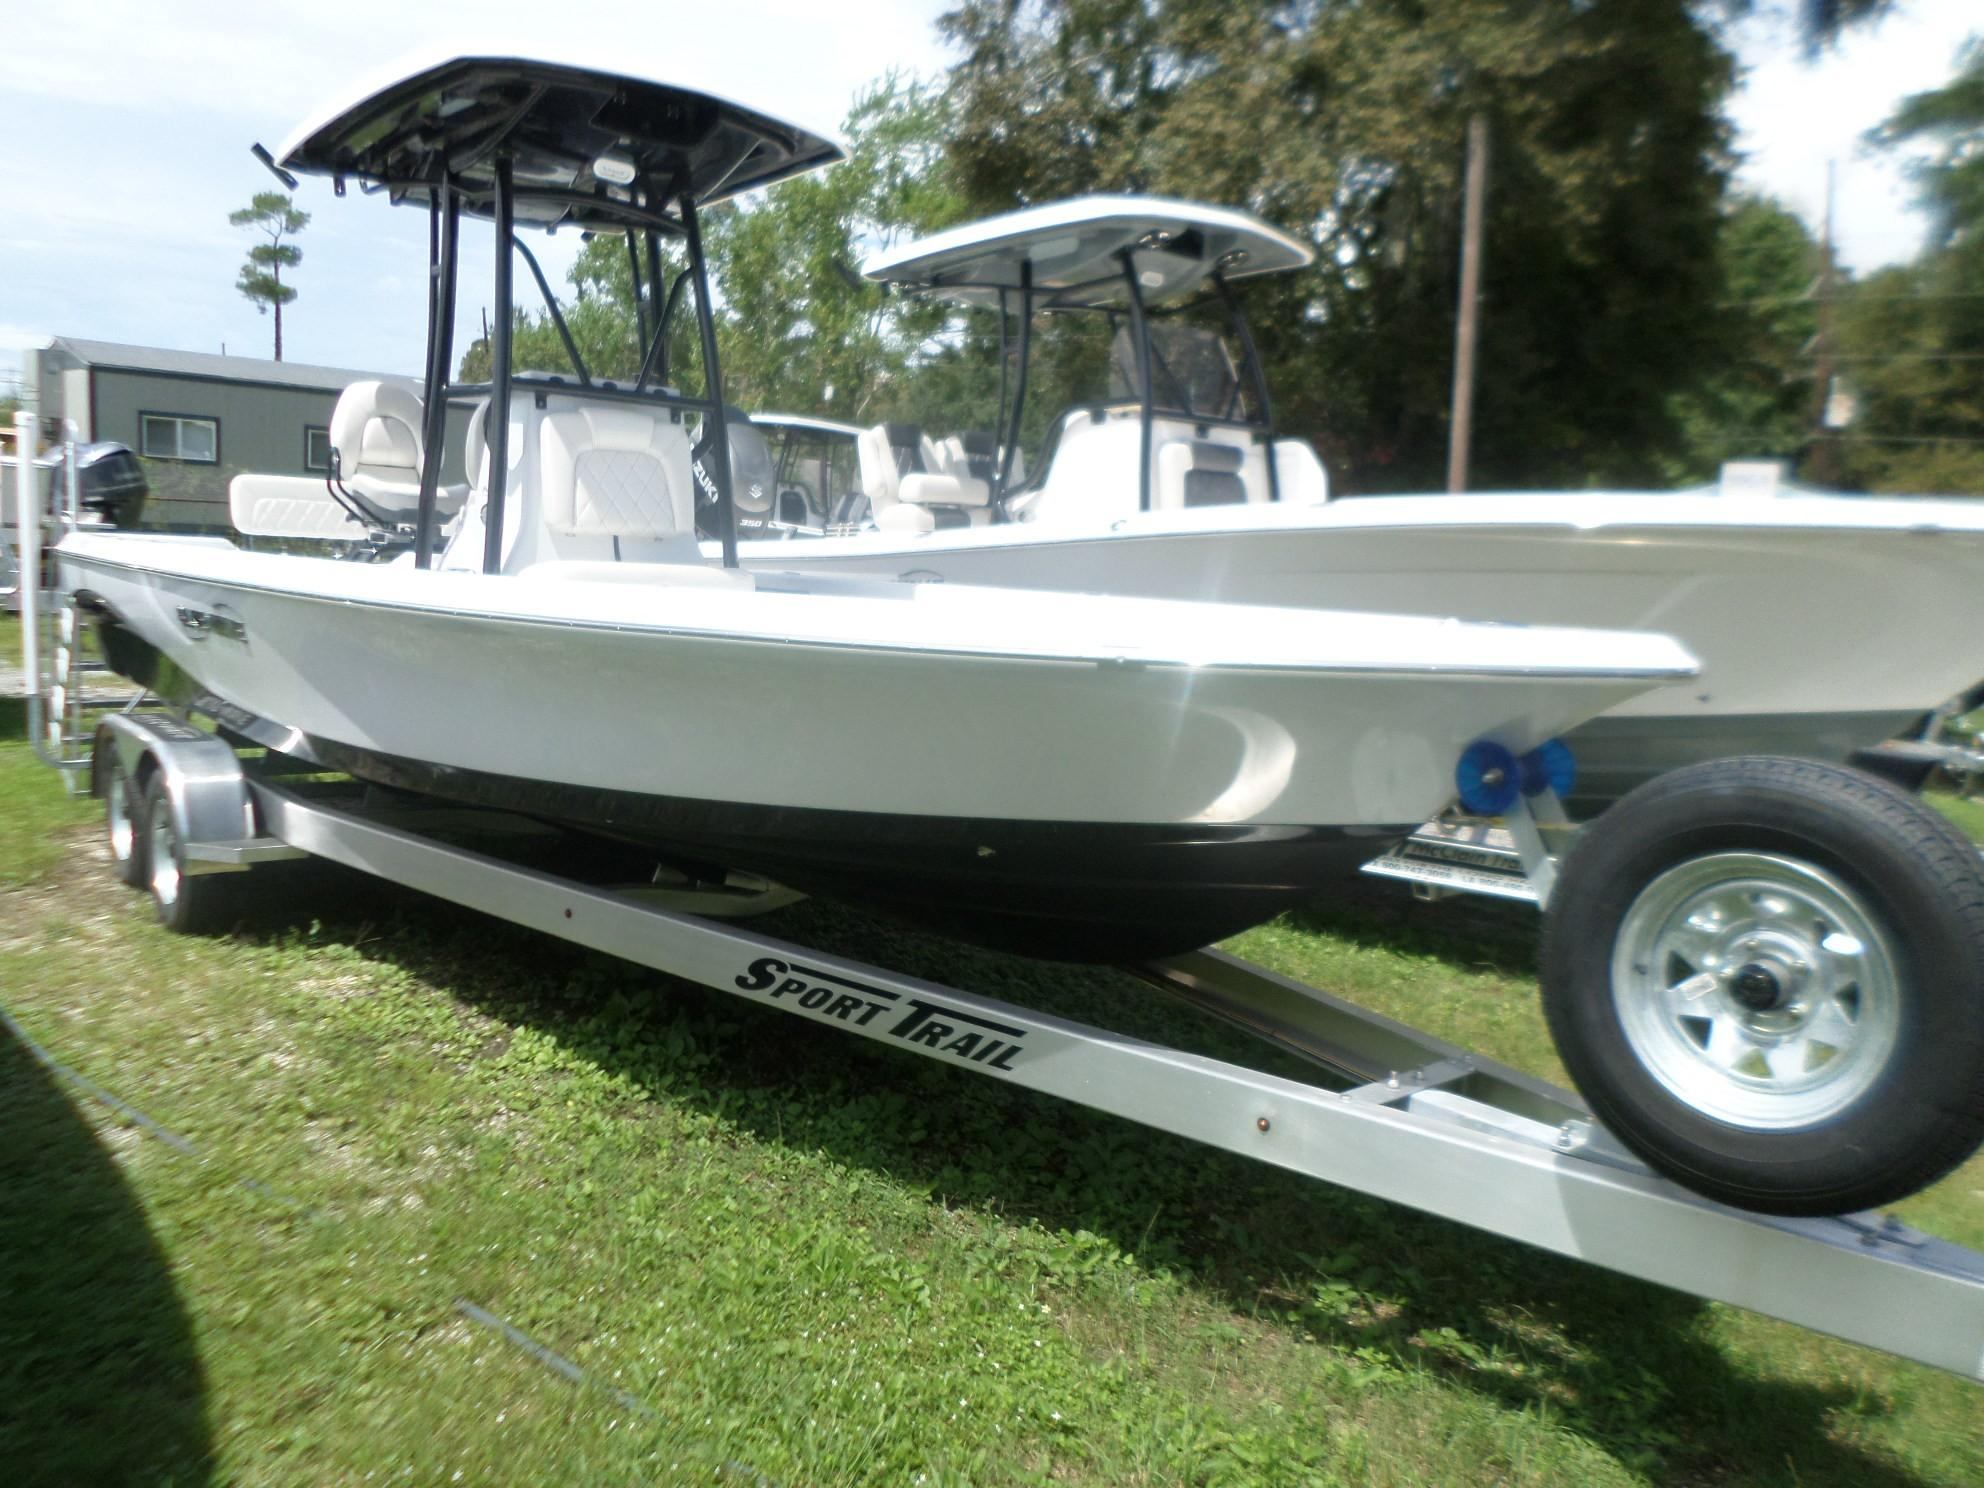 New  2018 24' Blue Wave 2400 PureBay Bay Boat in Slidell, Louisiana